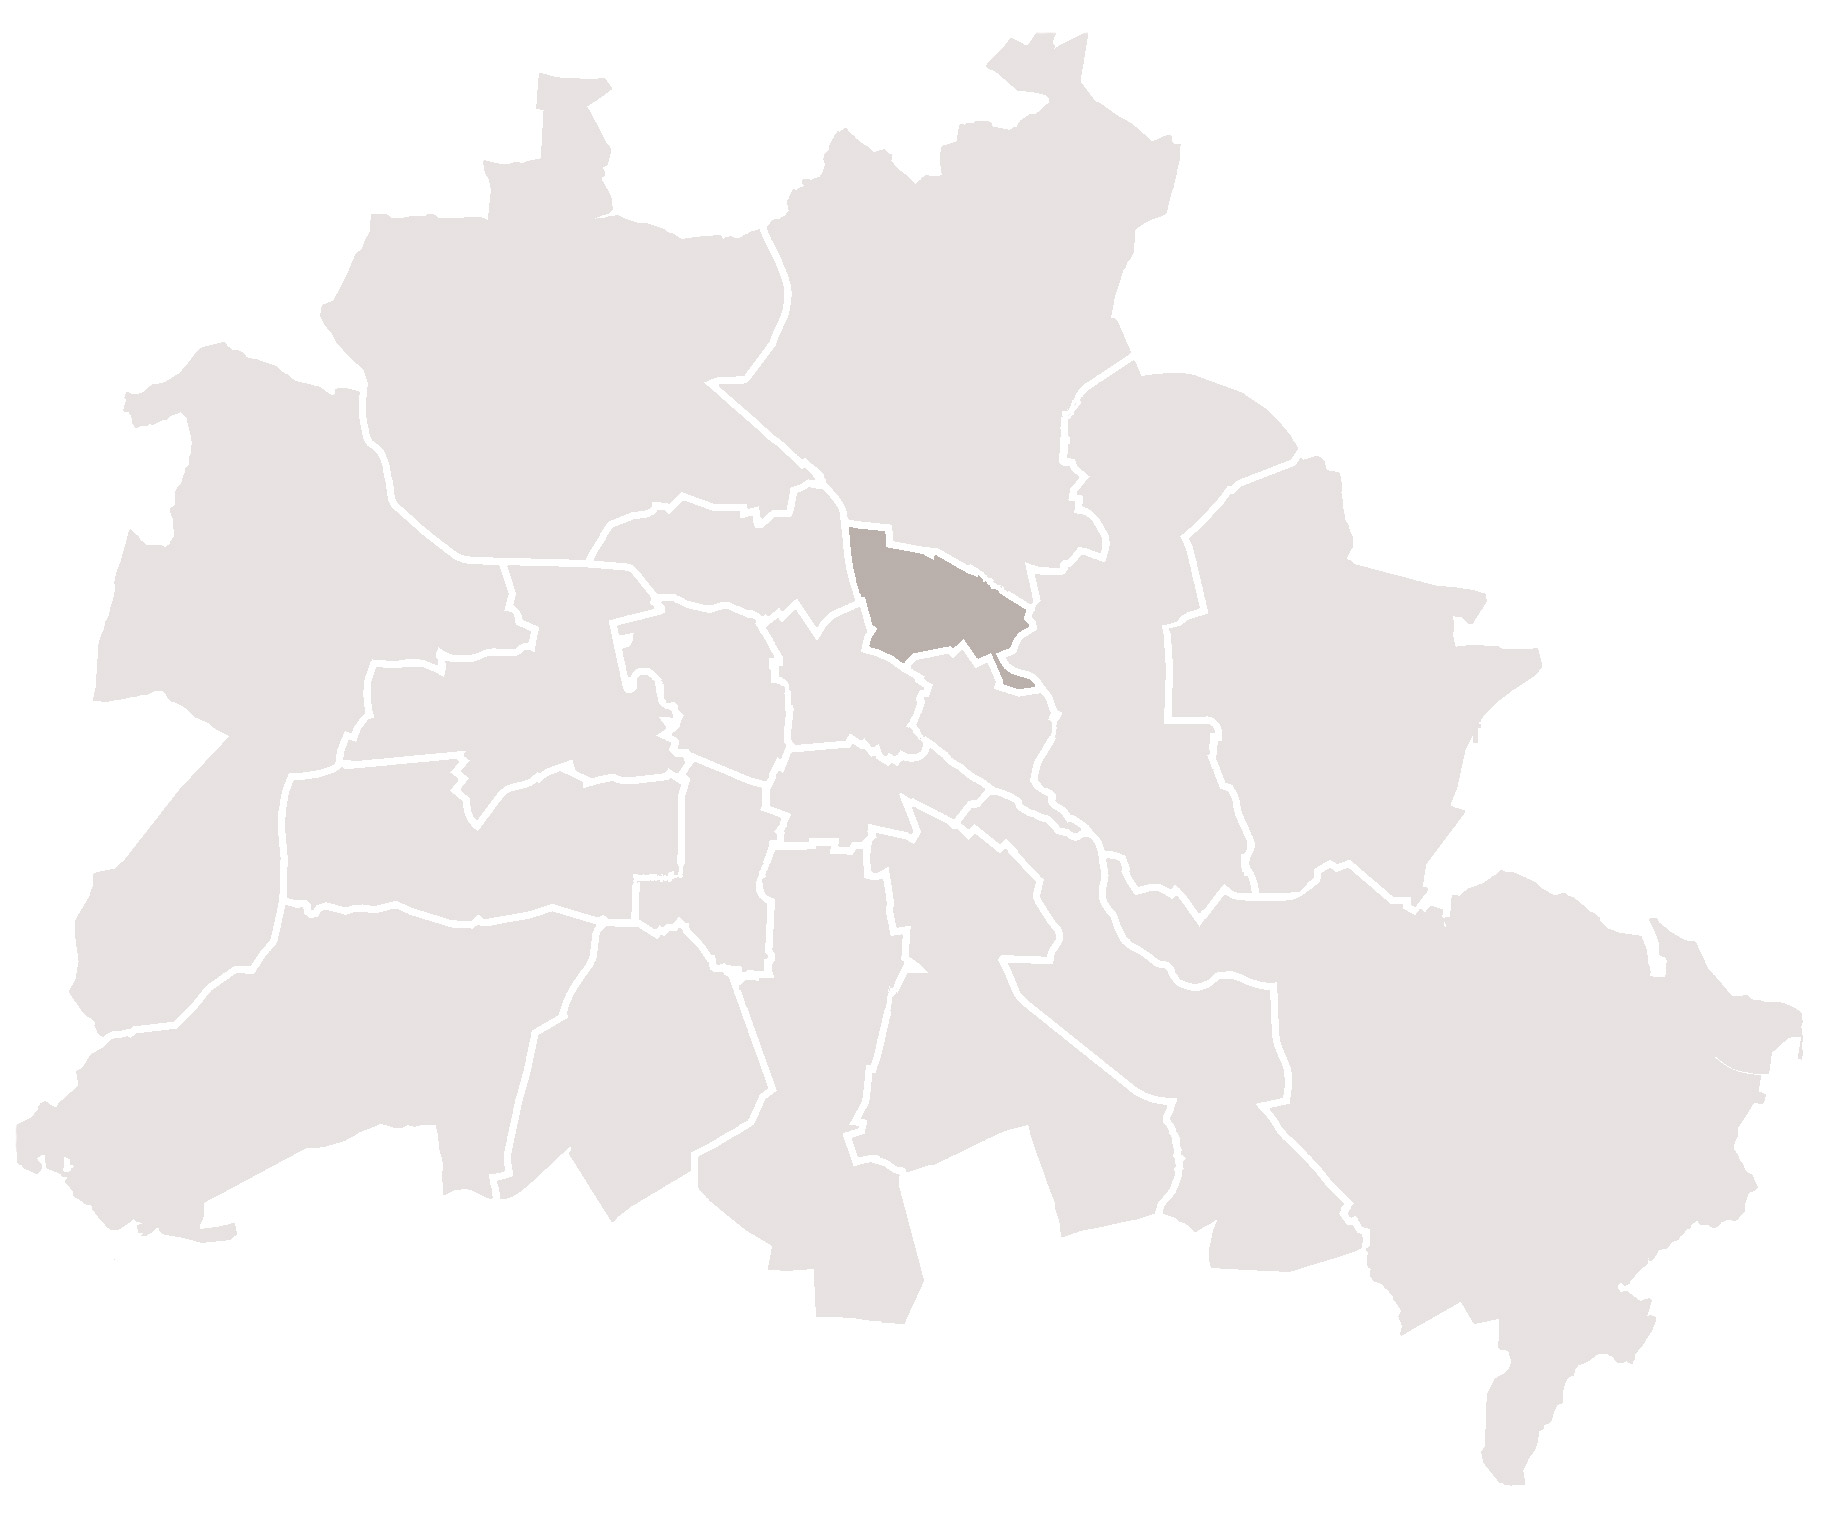 Unterkunft Nr 1490 Lage In Berlin Aufberlin Karte In Berlin